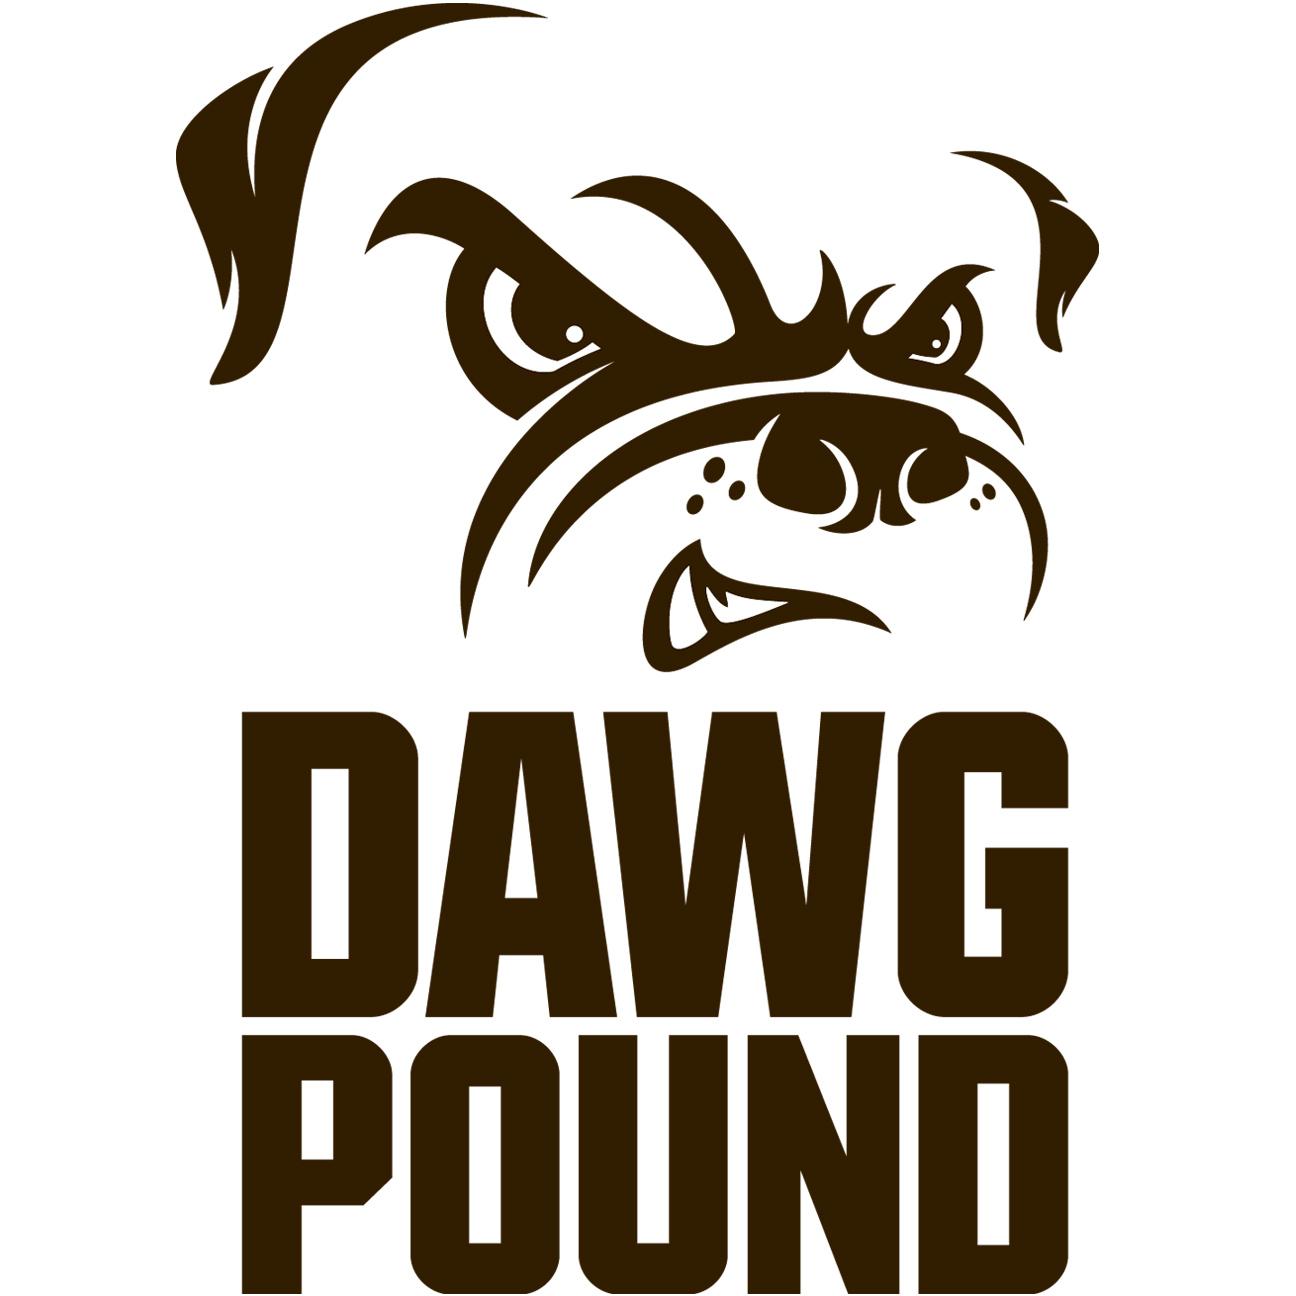 Cleveland Browns tweak helmet color, unveil new Dawg Pound ...